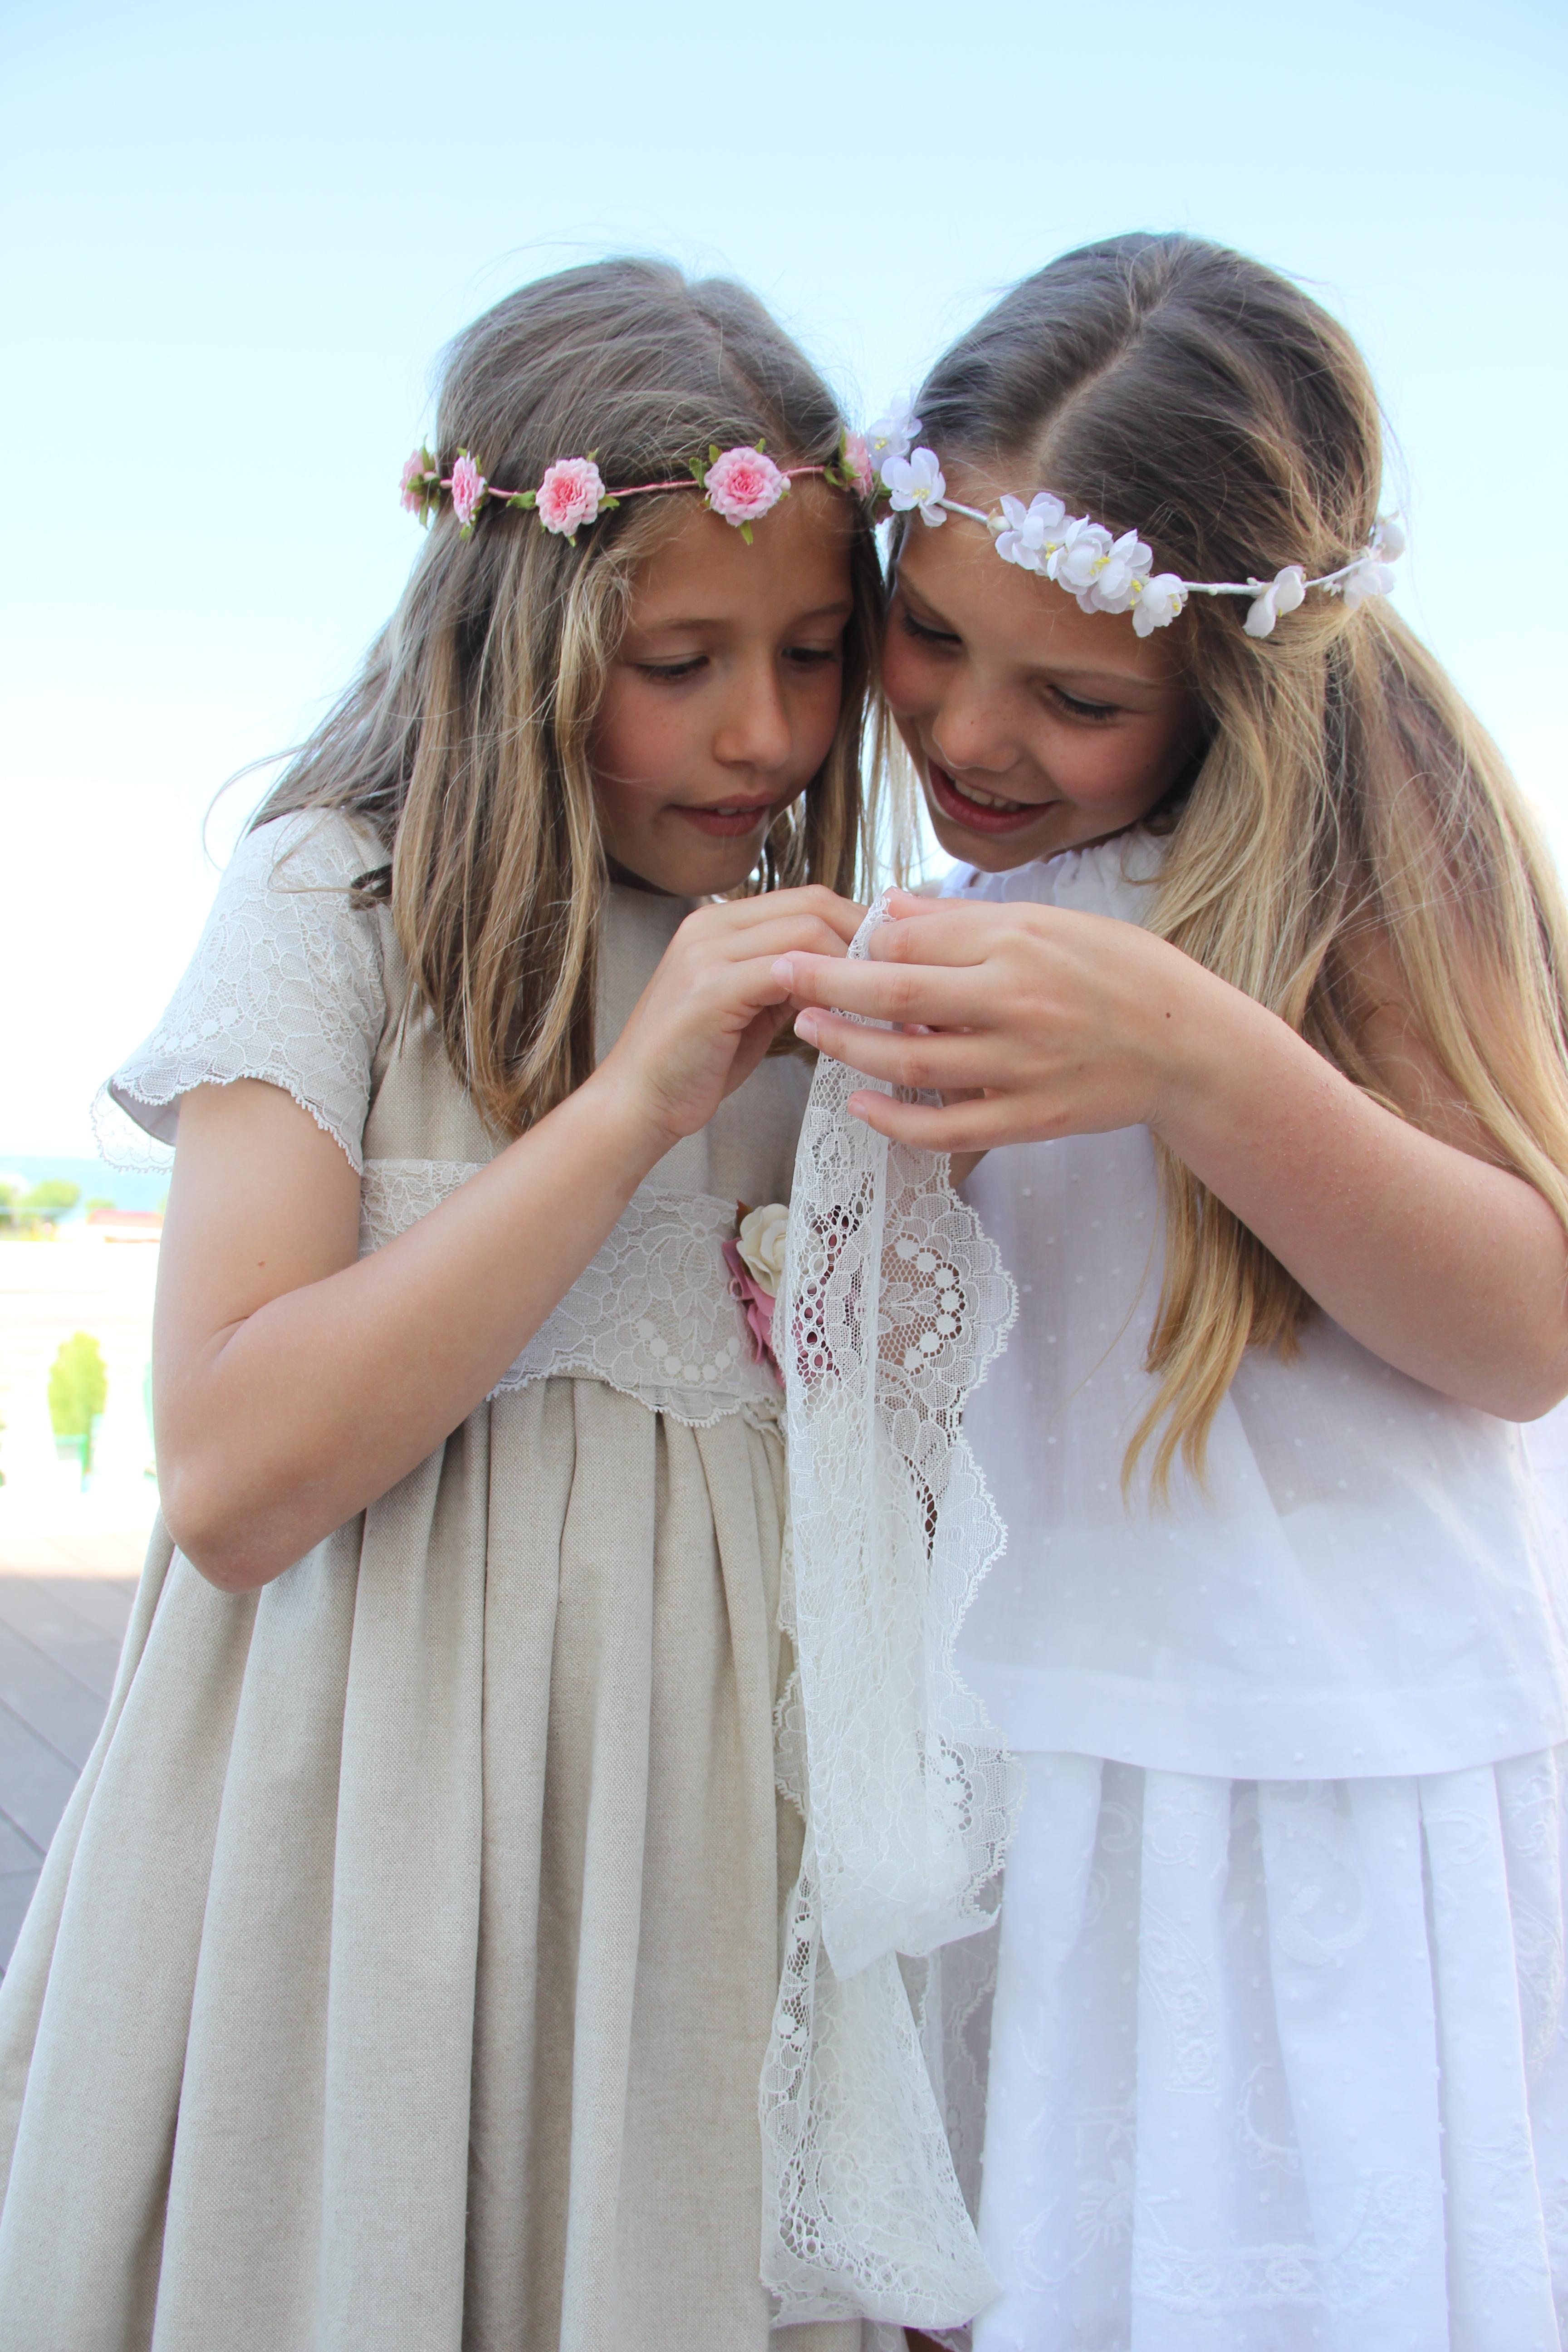 niñas con estilo, moda infantil estilosa,vestido de comunion, comunion 2017, arras online, alta costura niños, ropa de ceremonia infantil a medida, ceremonia infantil (10)